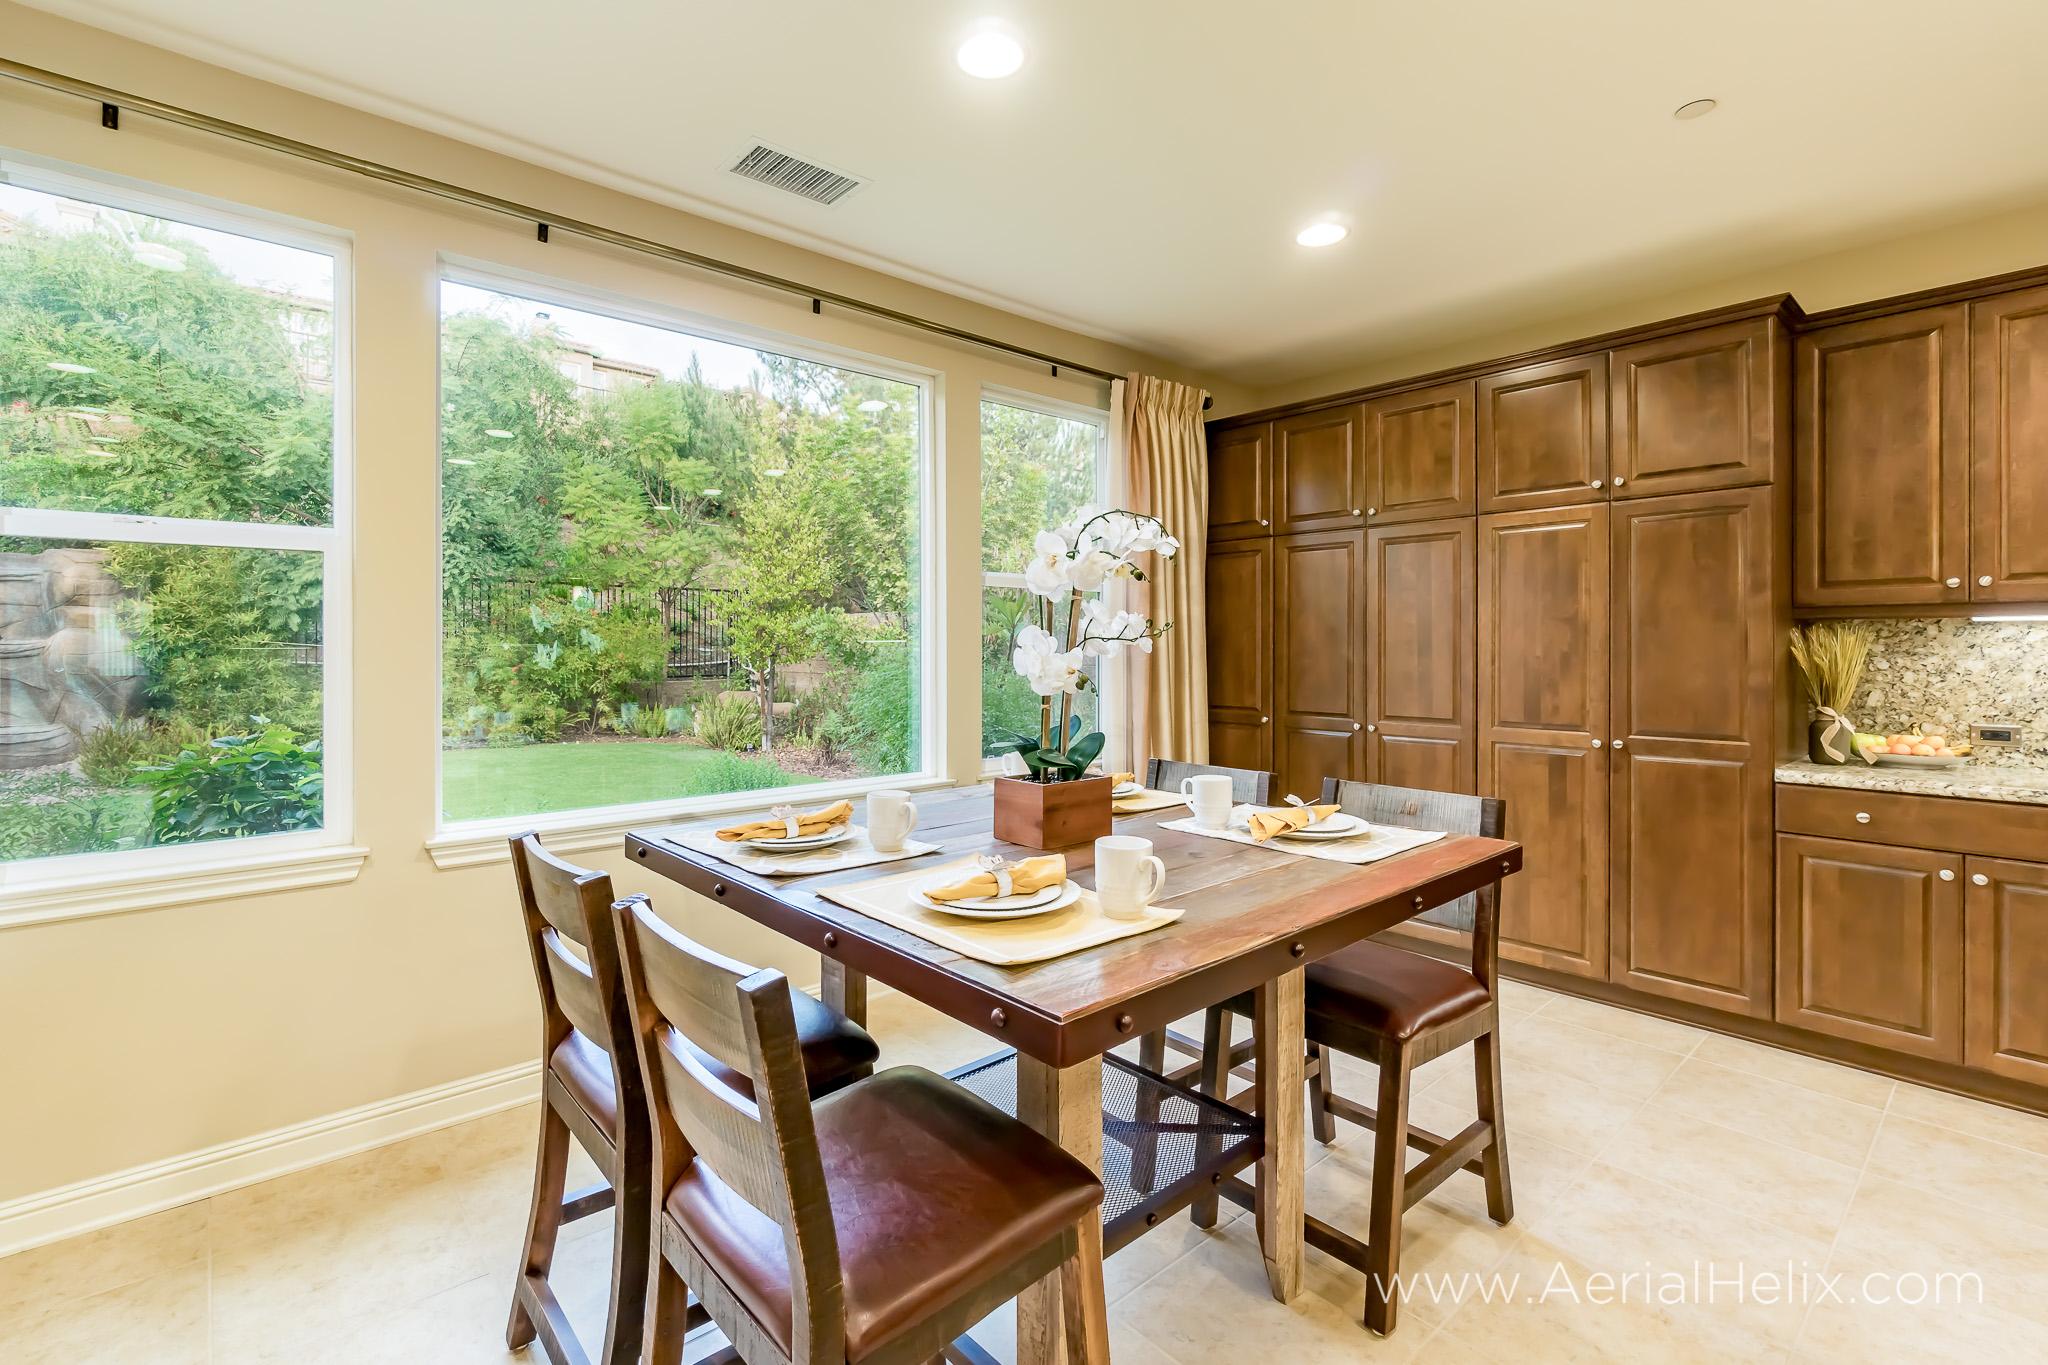 Chianti Ct Interior - Real Estate Photographer-13.jpg